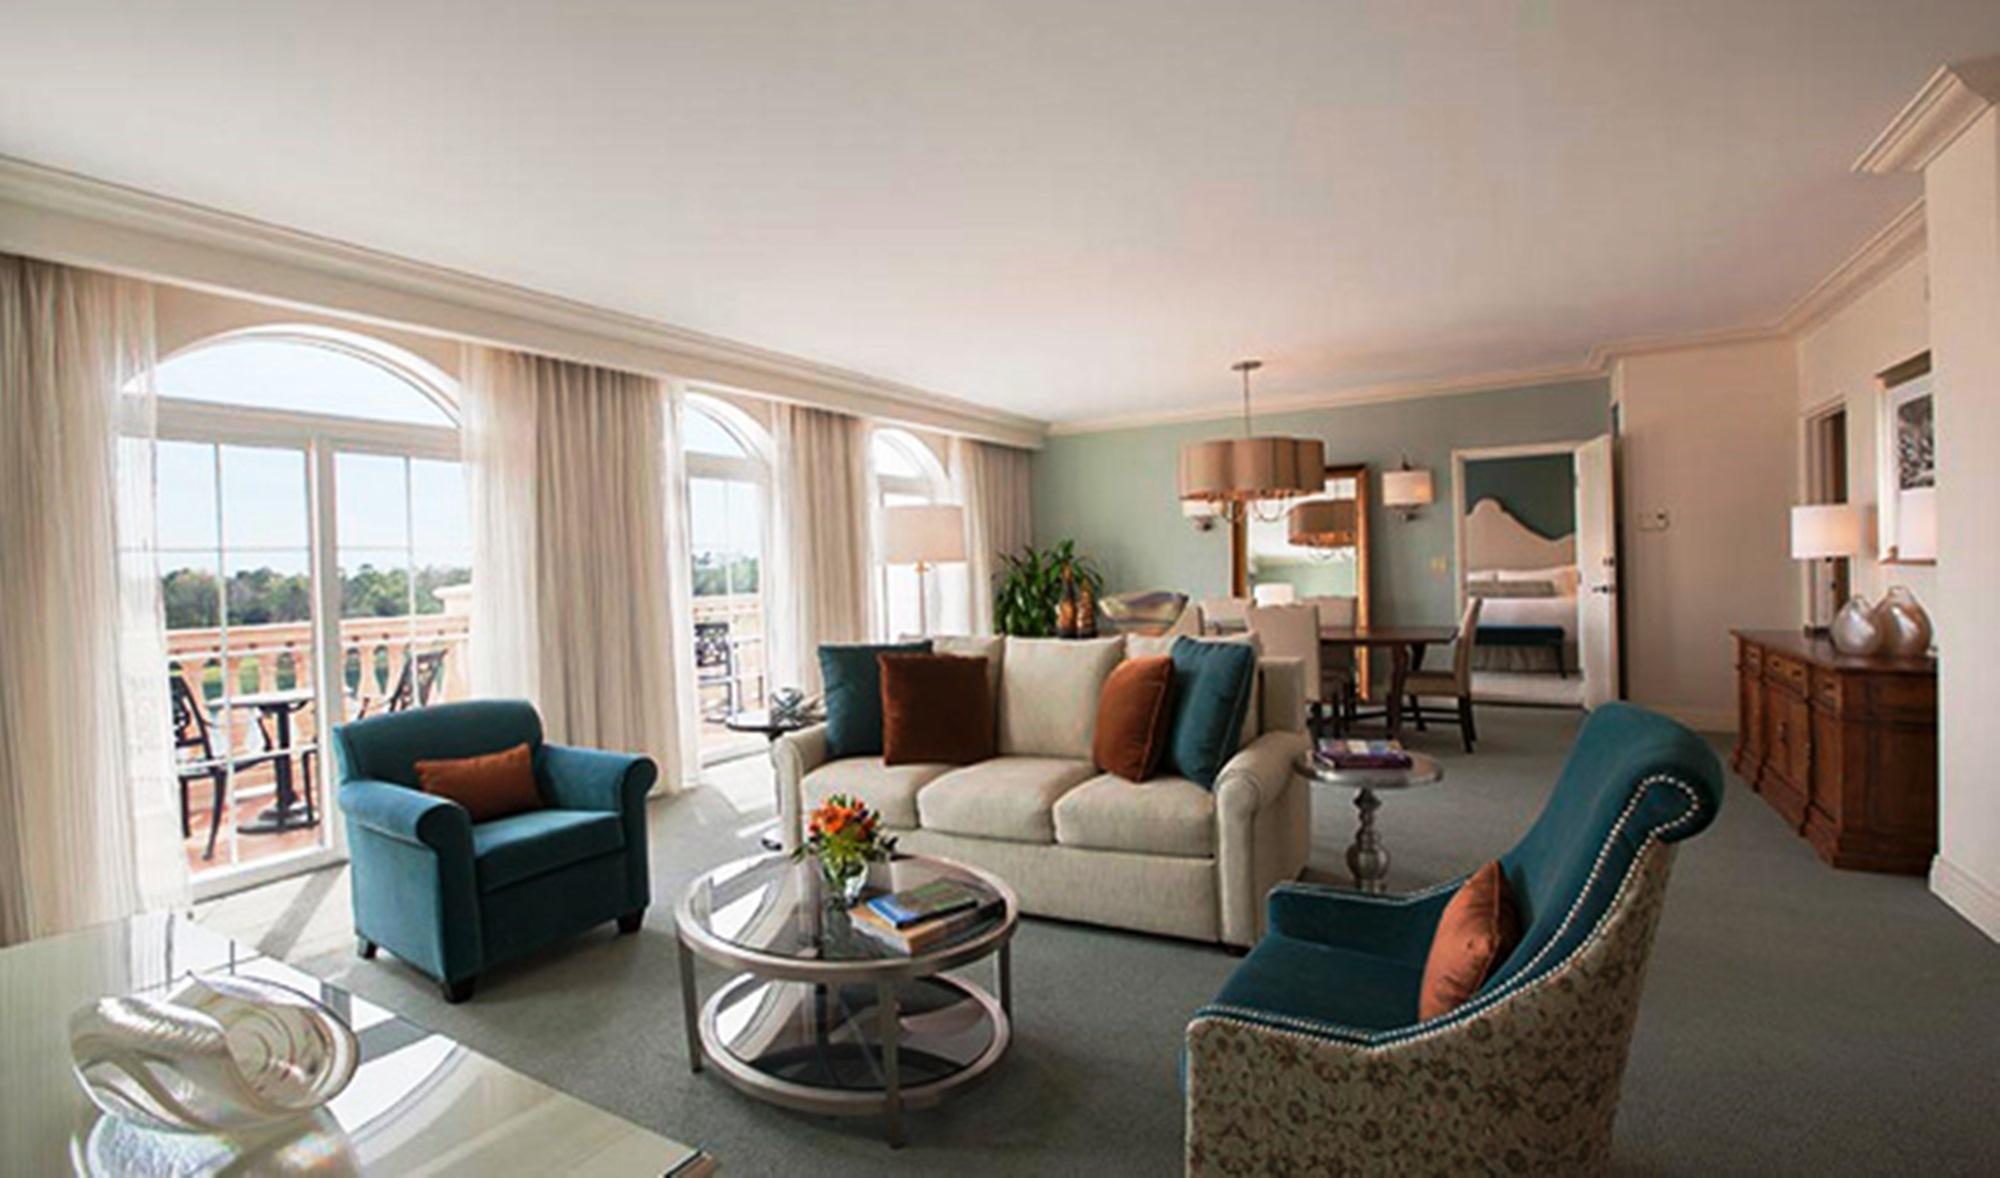 Loews Portofino Bay Hotel Rooms Complete Guide Photo Gallery